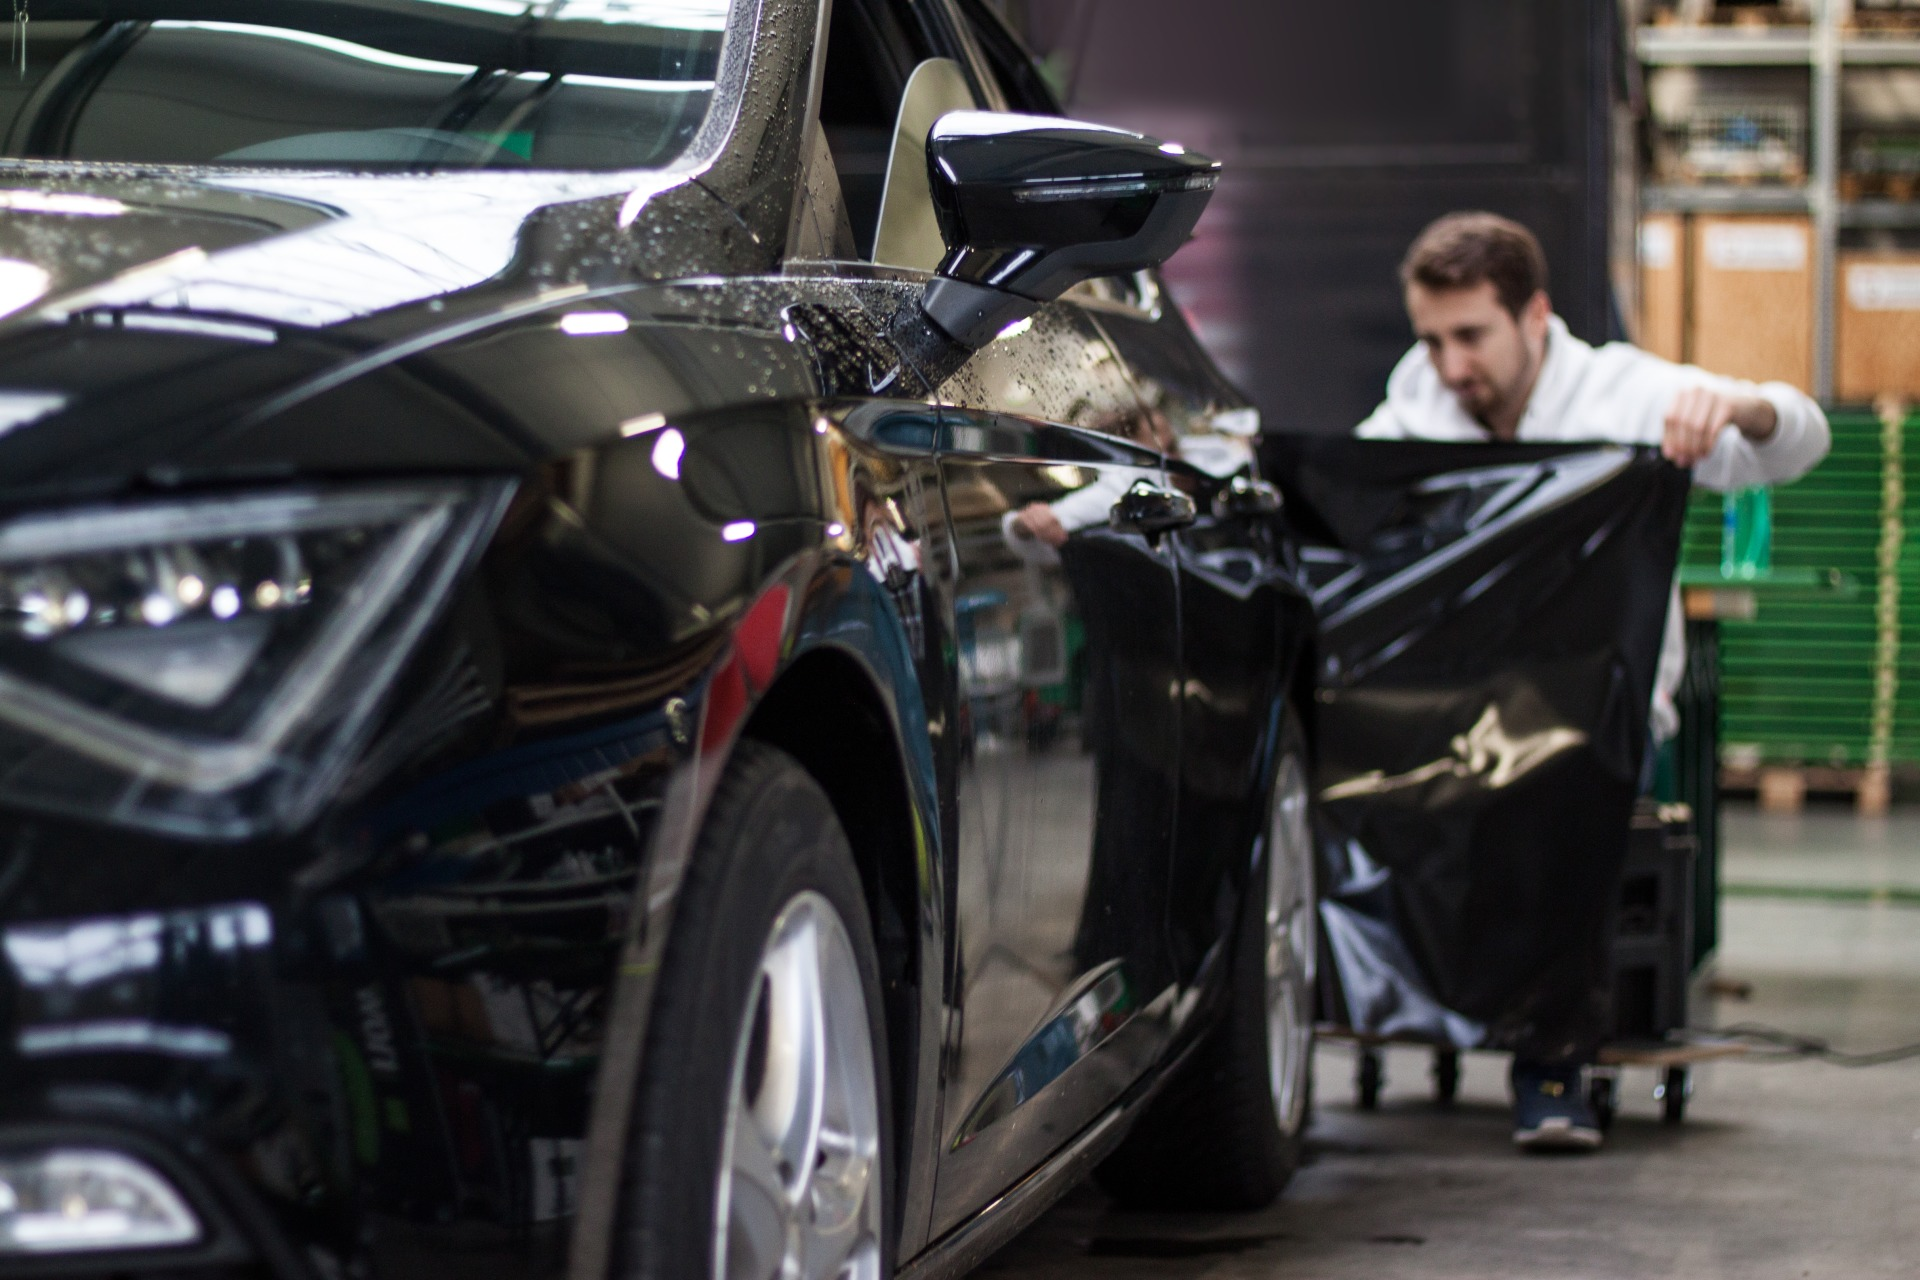 Neues Fahrzeugdesign – Felix Hertlein erklärt es uns Schritt für Schritt